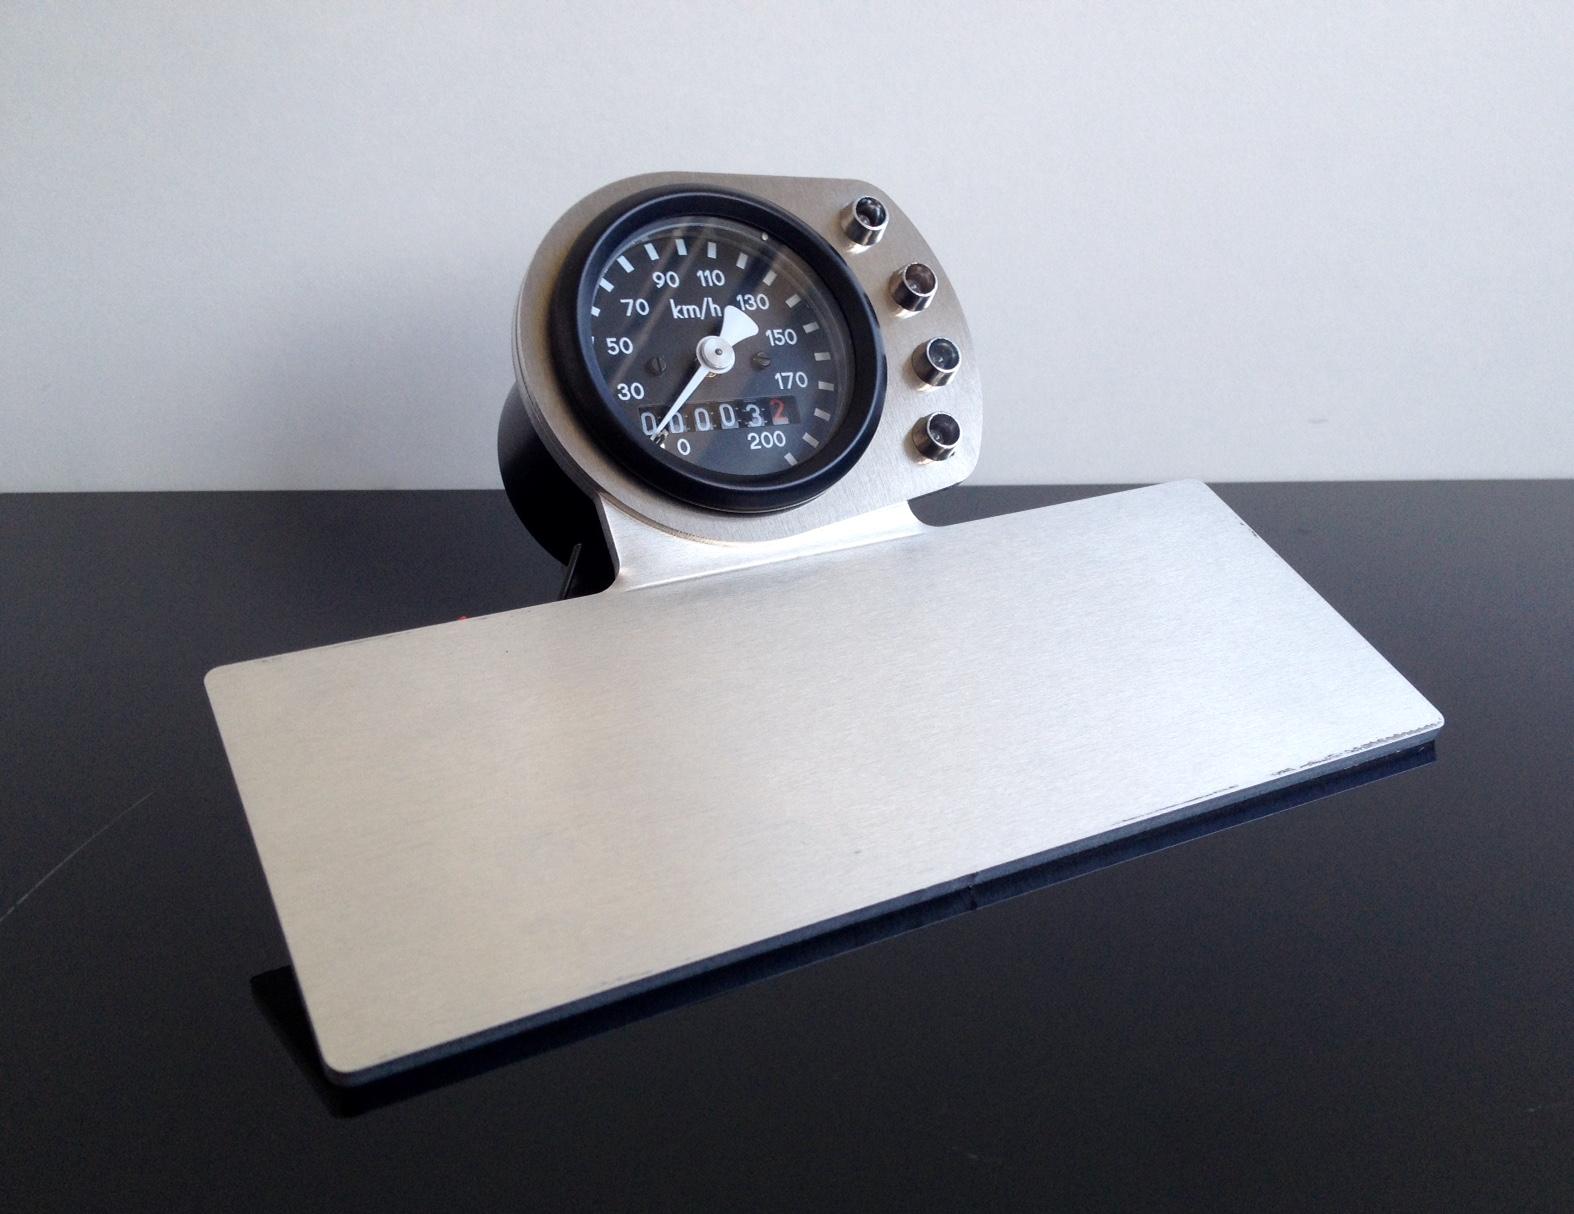 tachohalter speedo holder bracket cadre support compteur tacho universal ebay. Black Bedroom Furniture Sets. Home Design Ideas